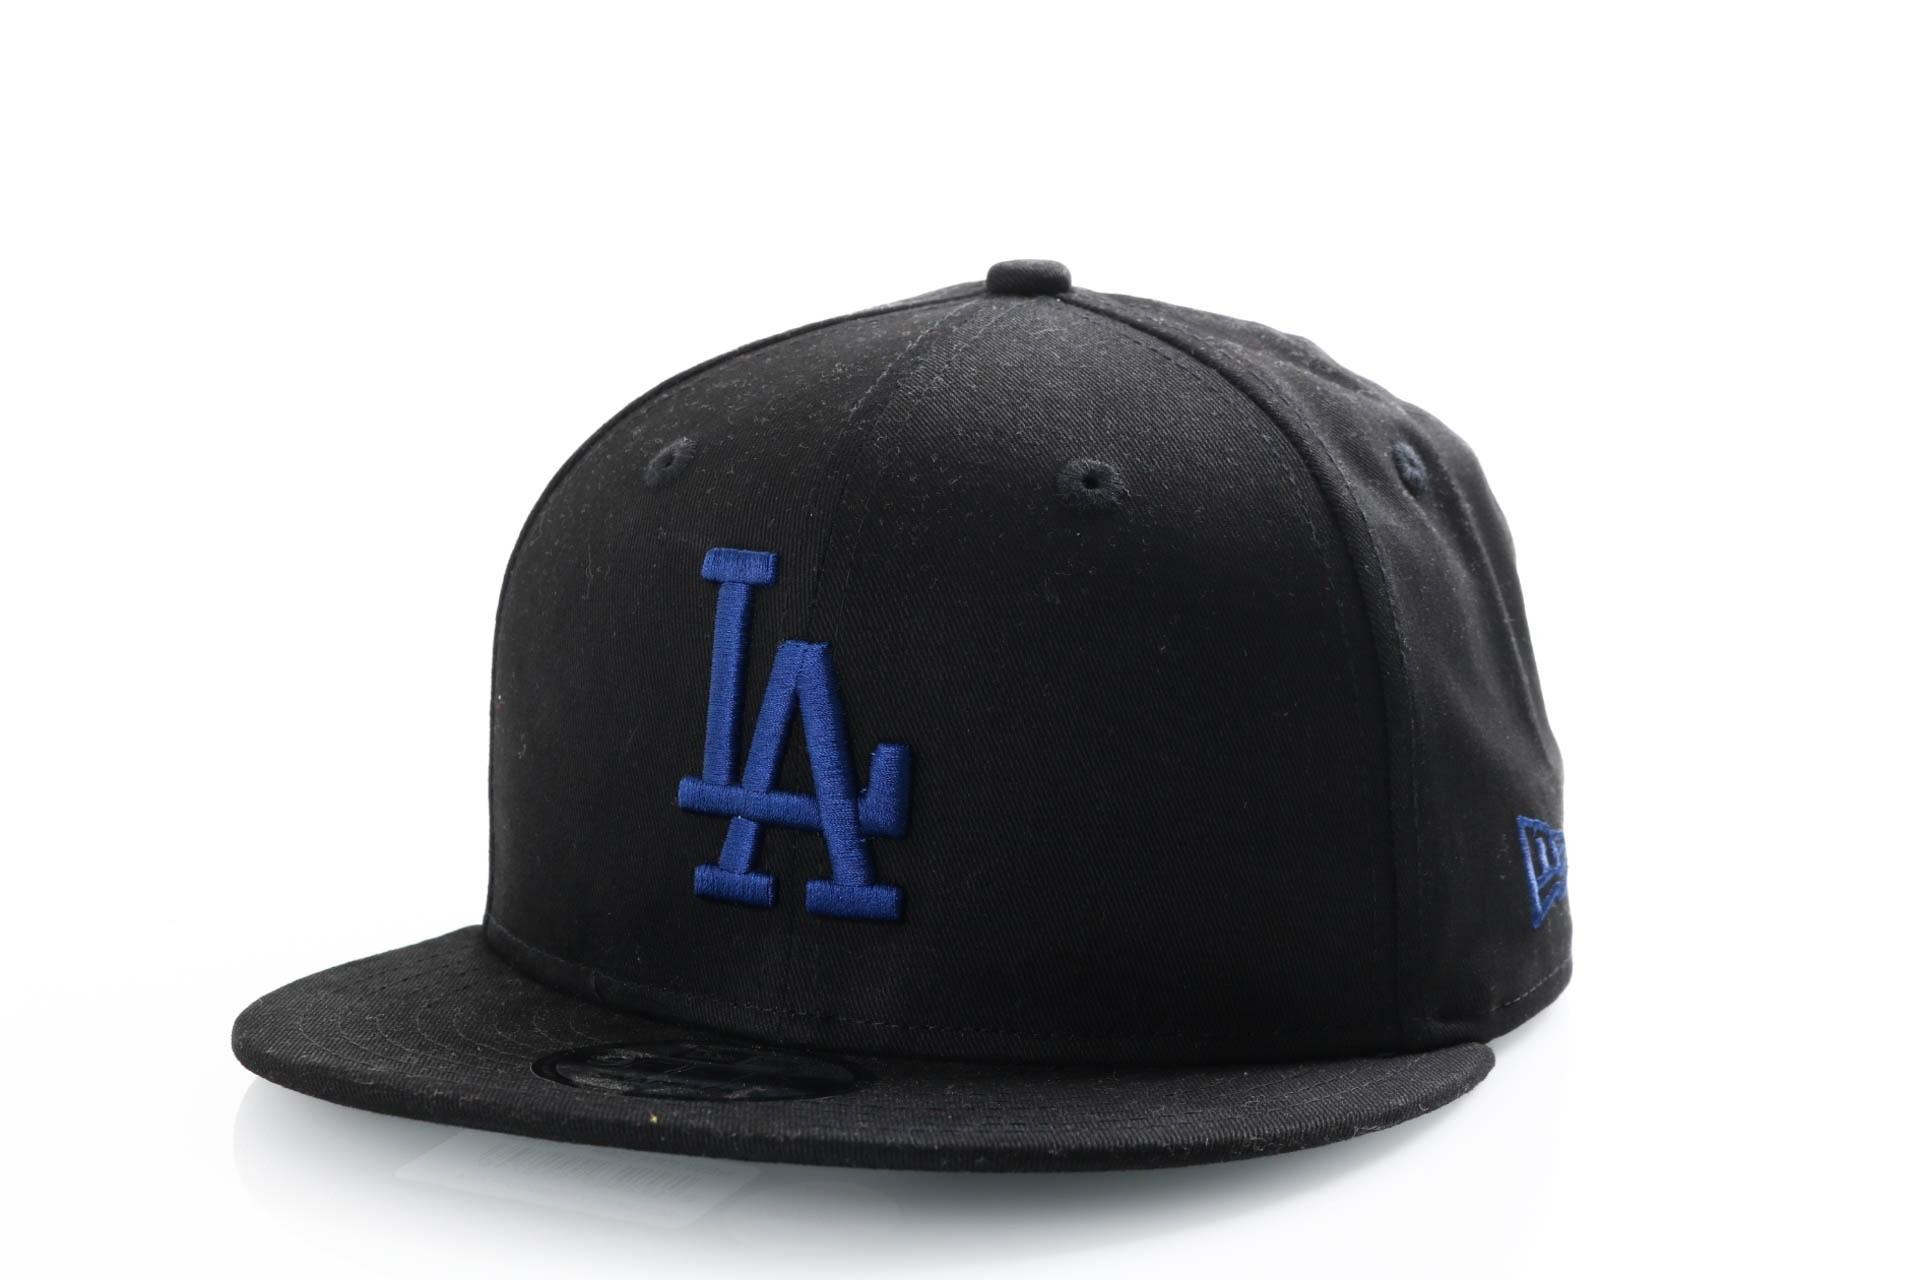 Afbeelding van New Era 9Fifty 11871432 Snapback Cap Black/Dark Royal Los Angeles Dodgers